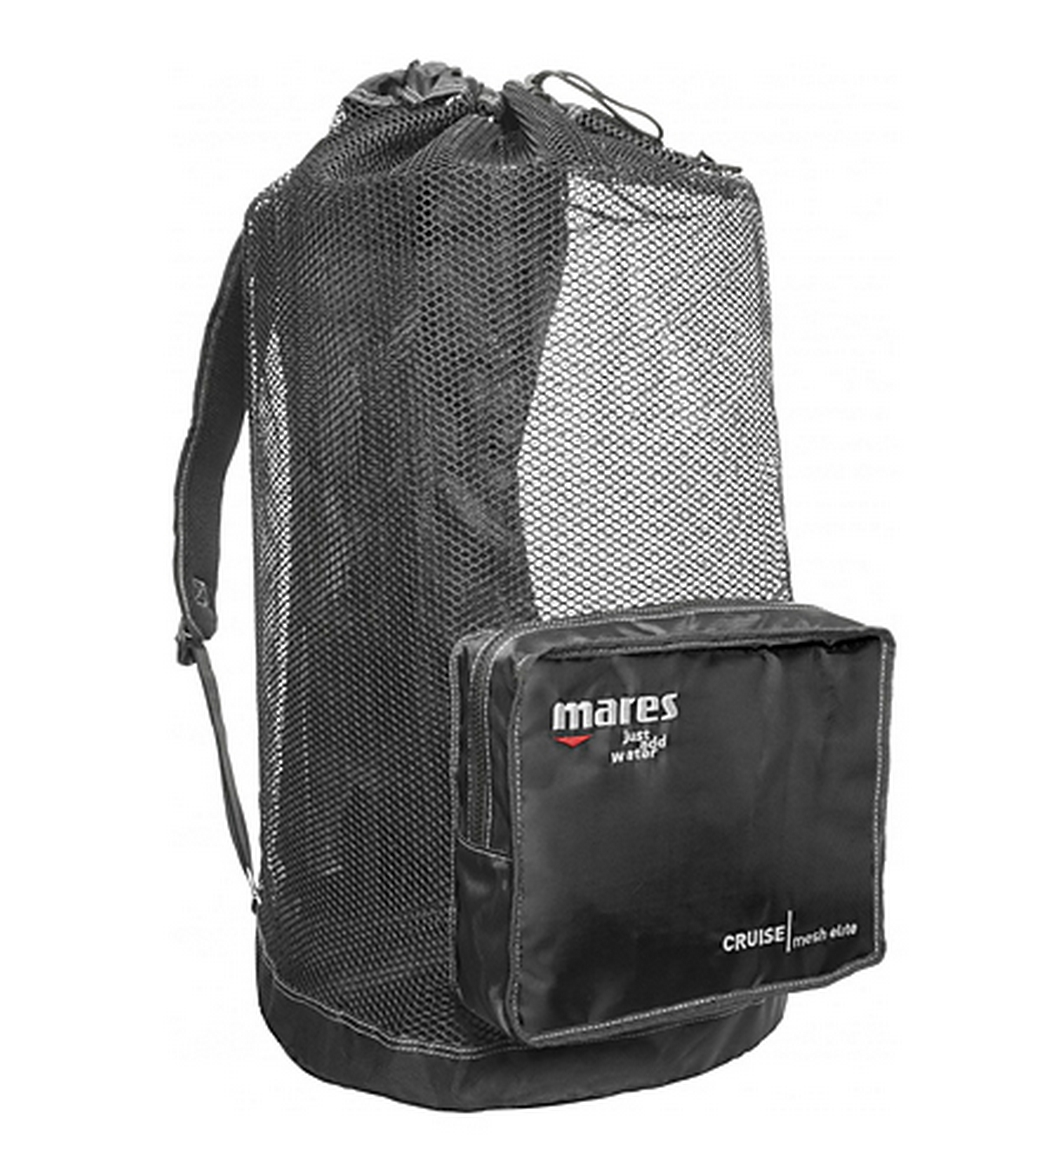 Mares elite cruise mesh backpack dive bag at - Mares dive bag ...